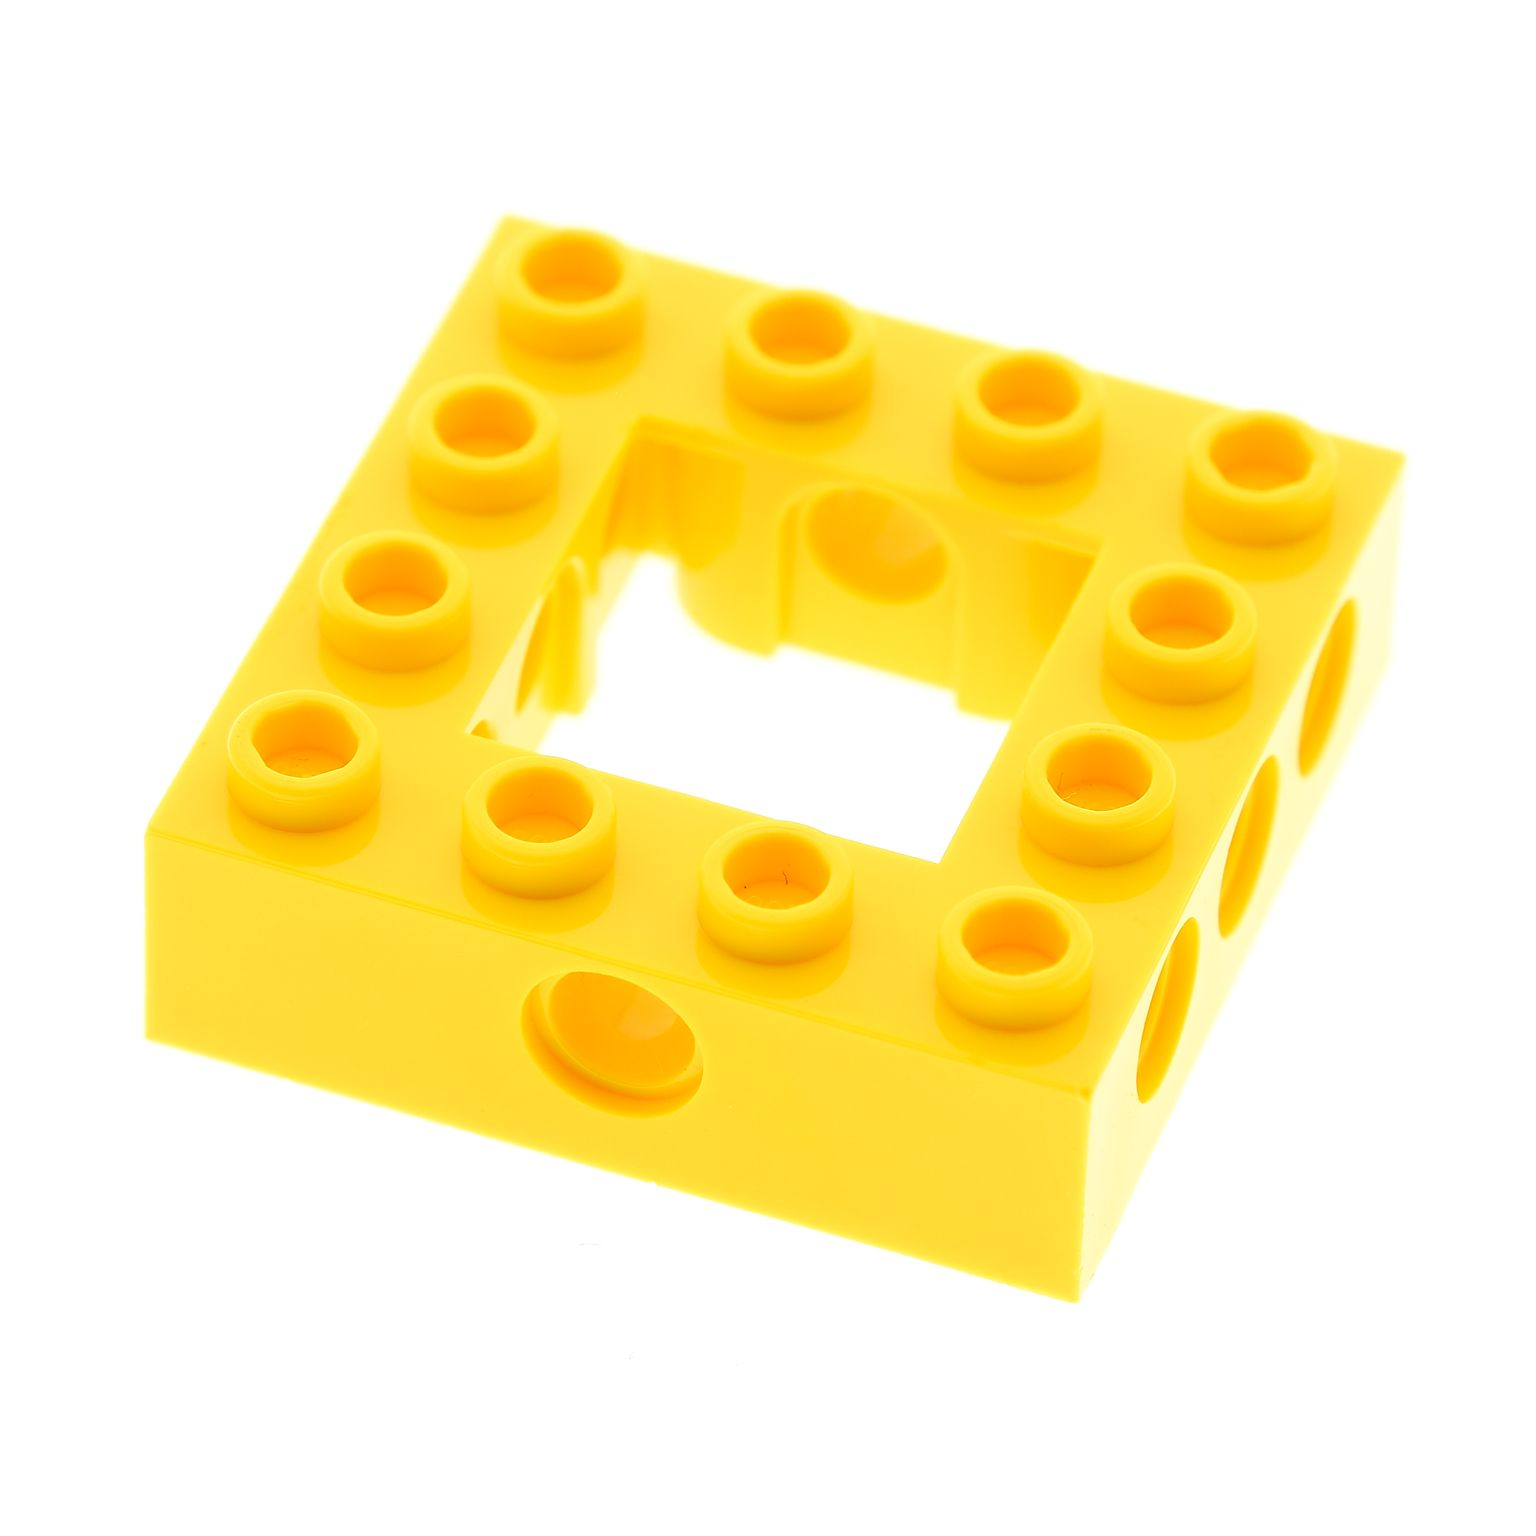 6 #32527 #32528 Lego Technic technology ever 2x Panels Panel Black No 5